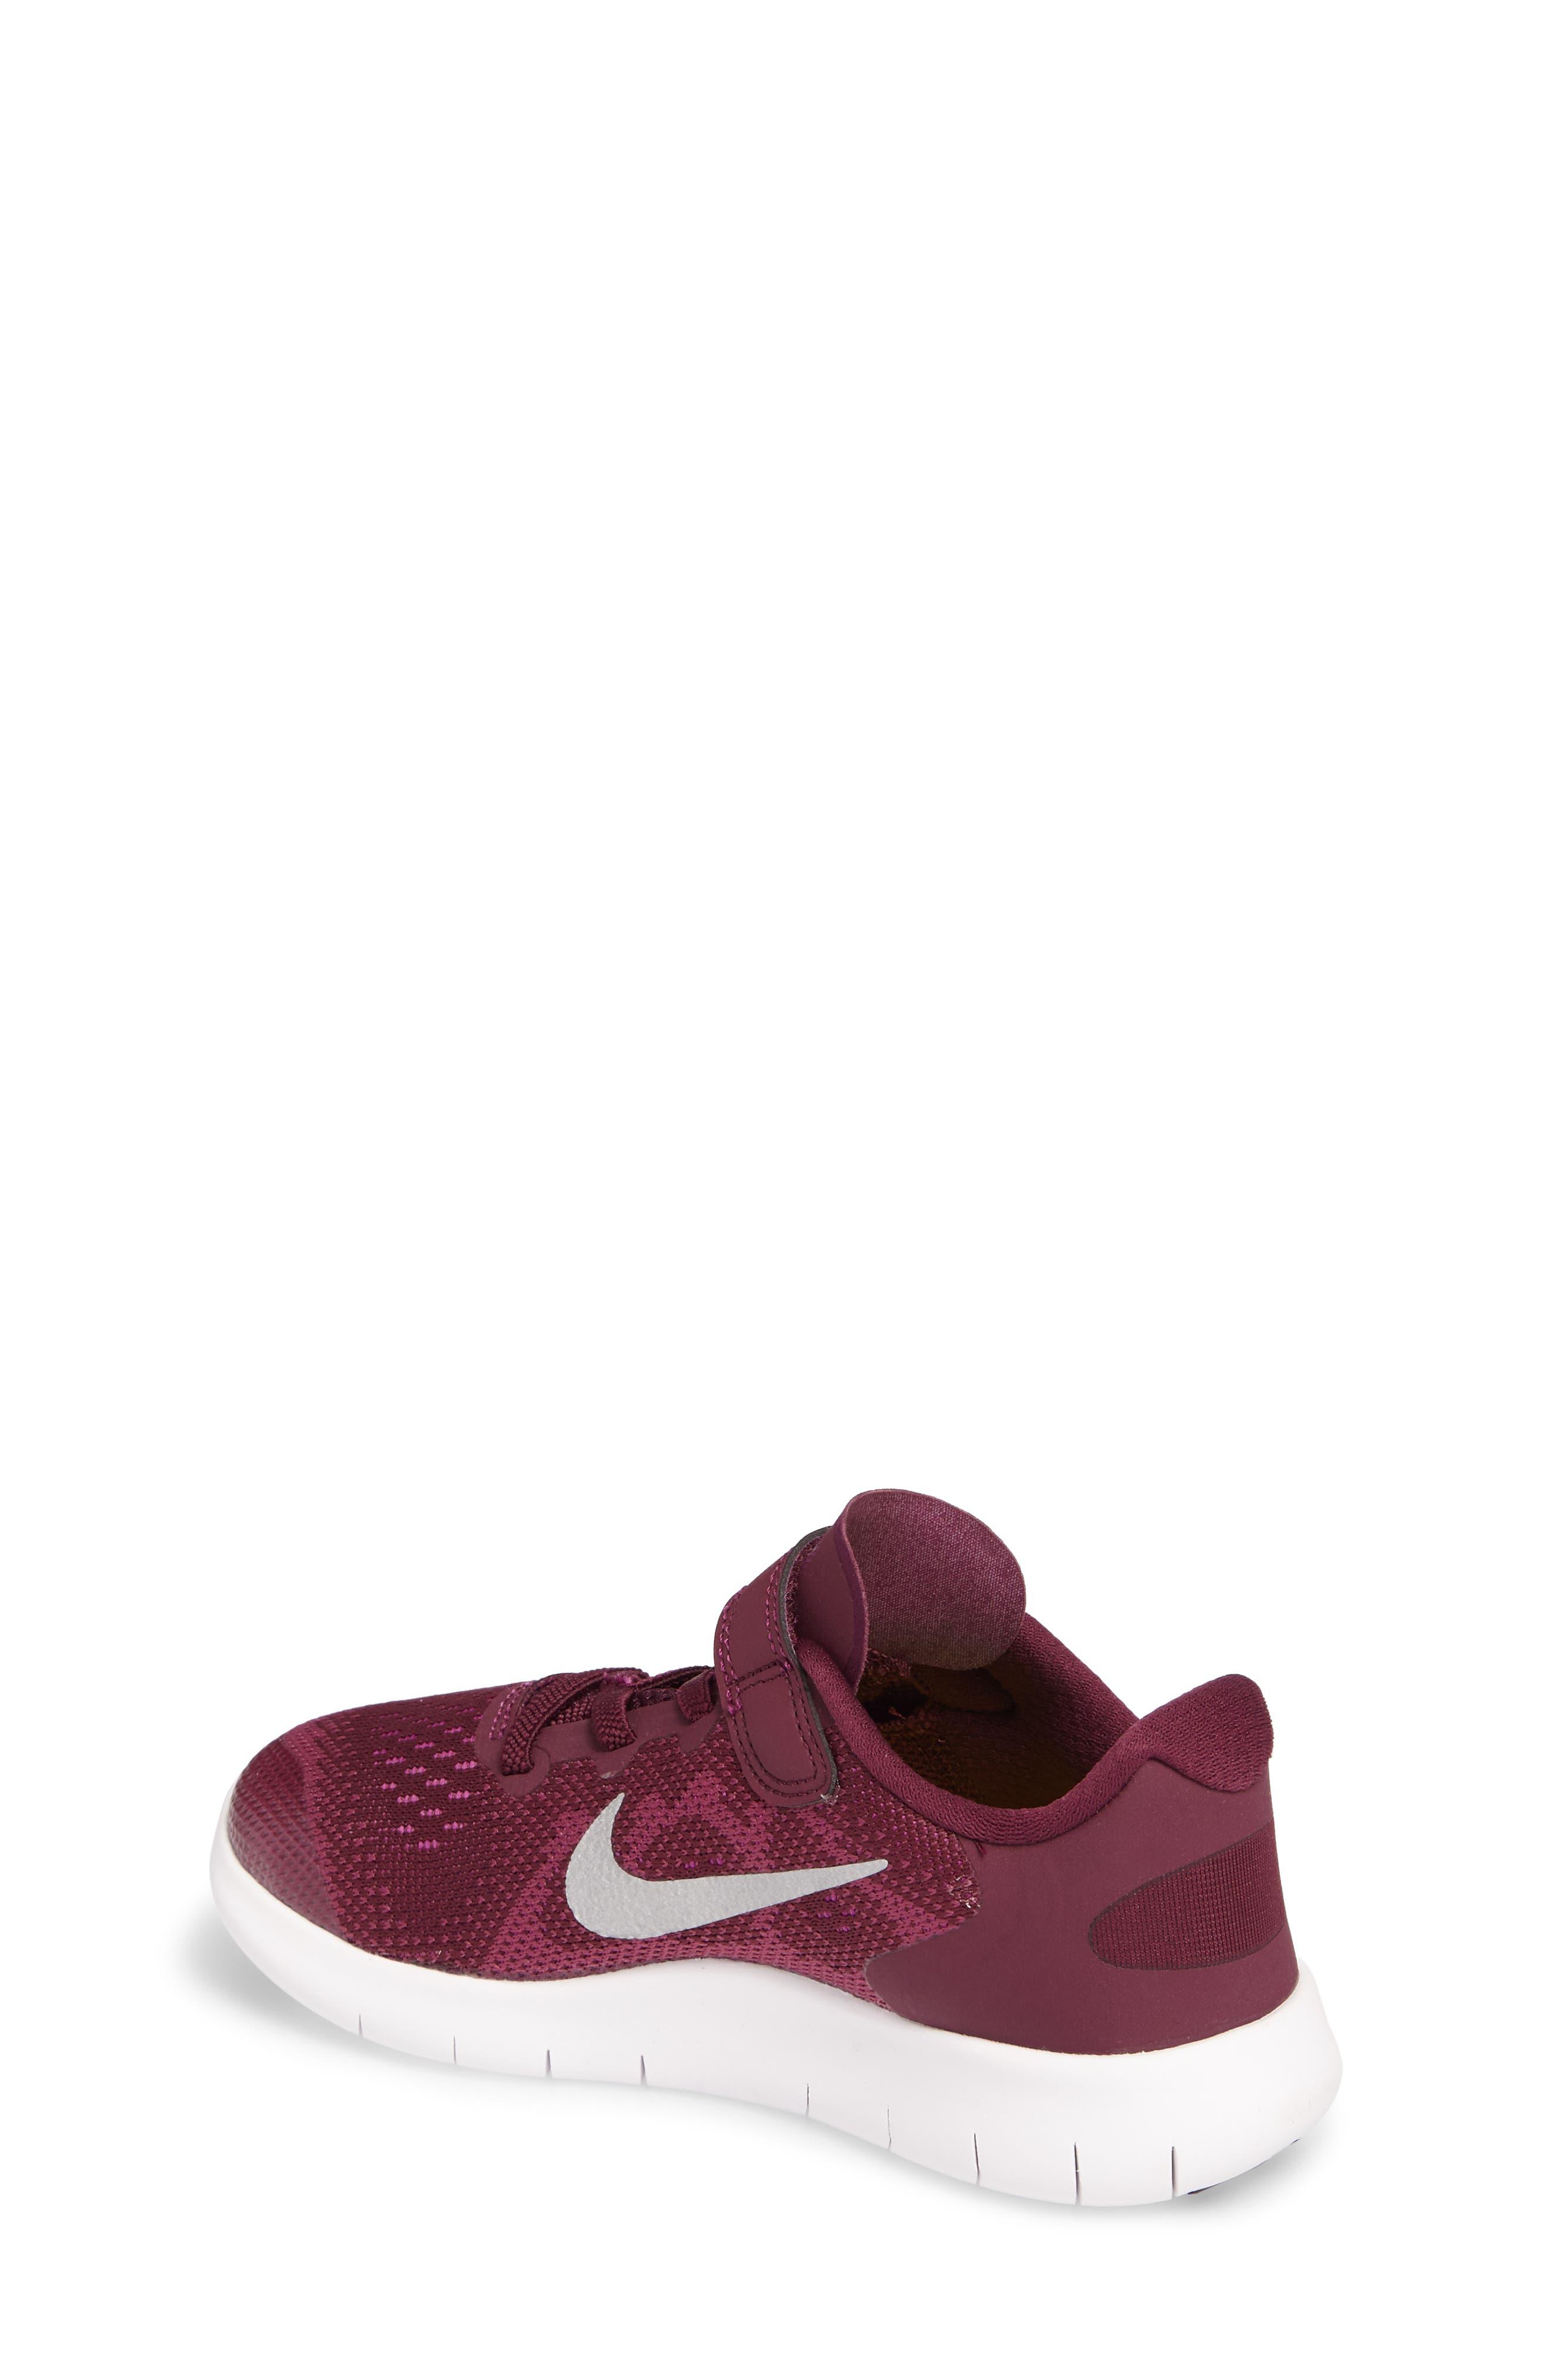 Free Run 2017 Sneaker,                             Alternate thumbnail 10, color,